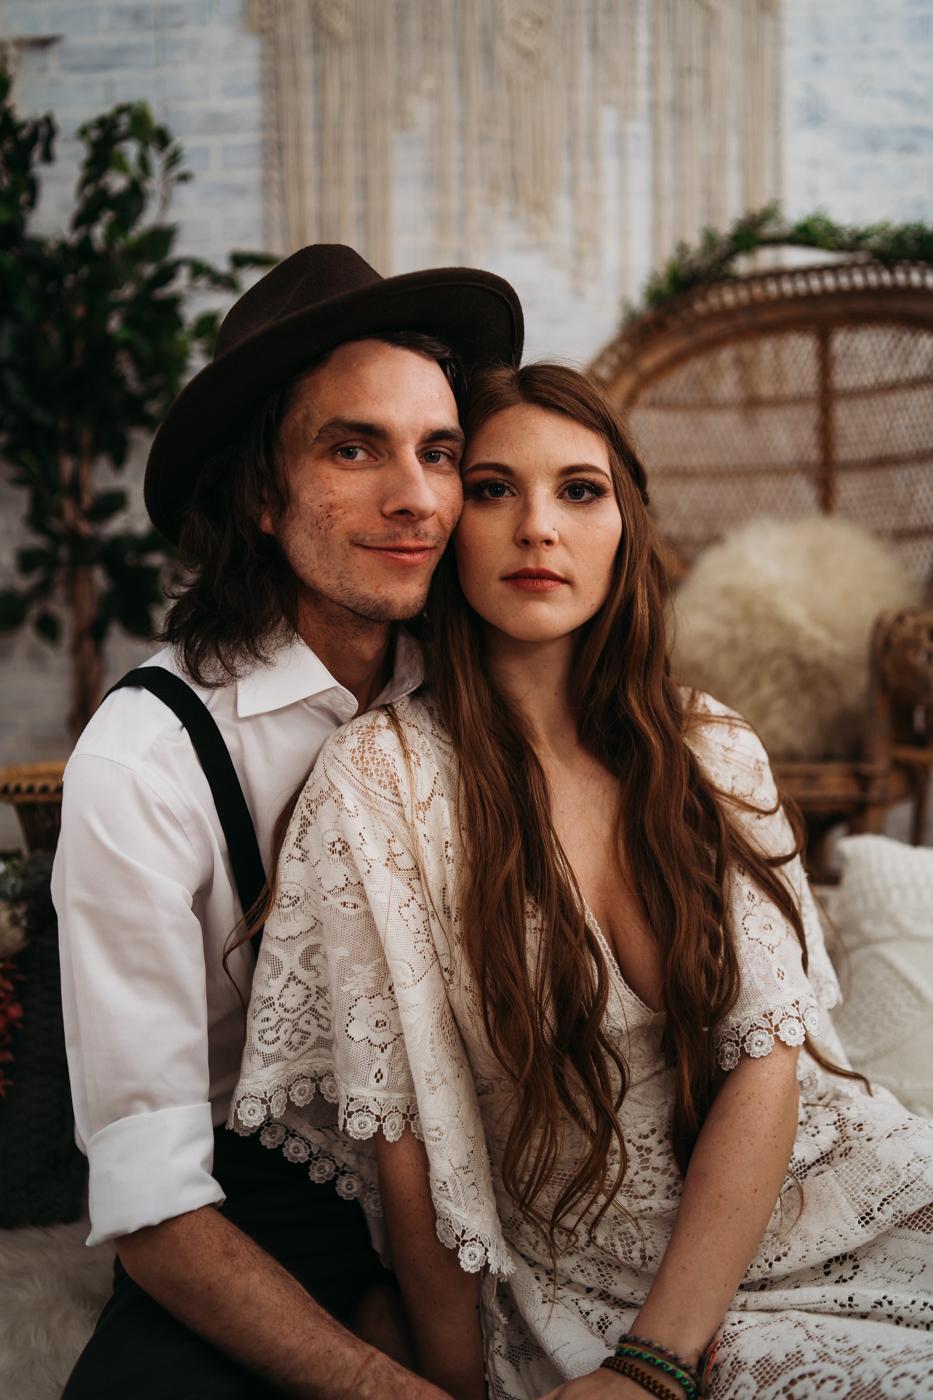 FortSt.John_photographer_TyraEPhotography_Wedding_Couple_Family_Photograhy_DawsonCreek_Elopement_Bride_Boduoir_Portraits-00057.jpg